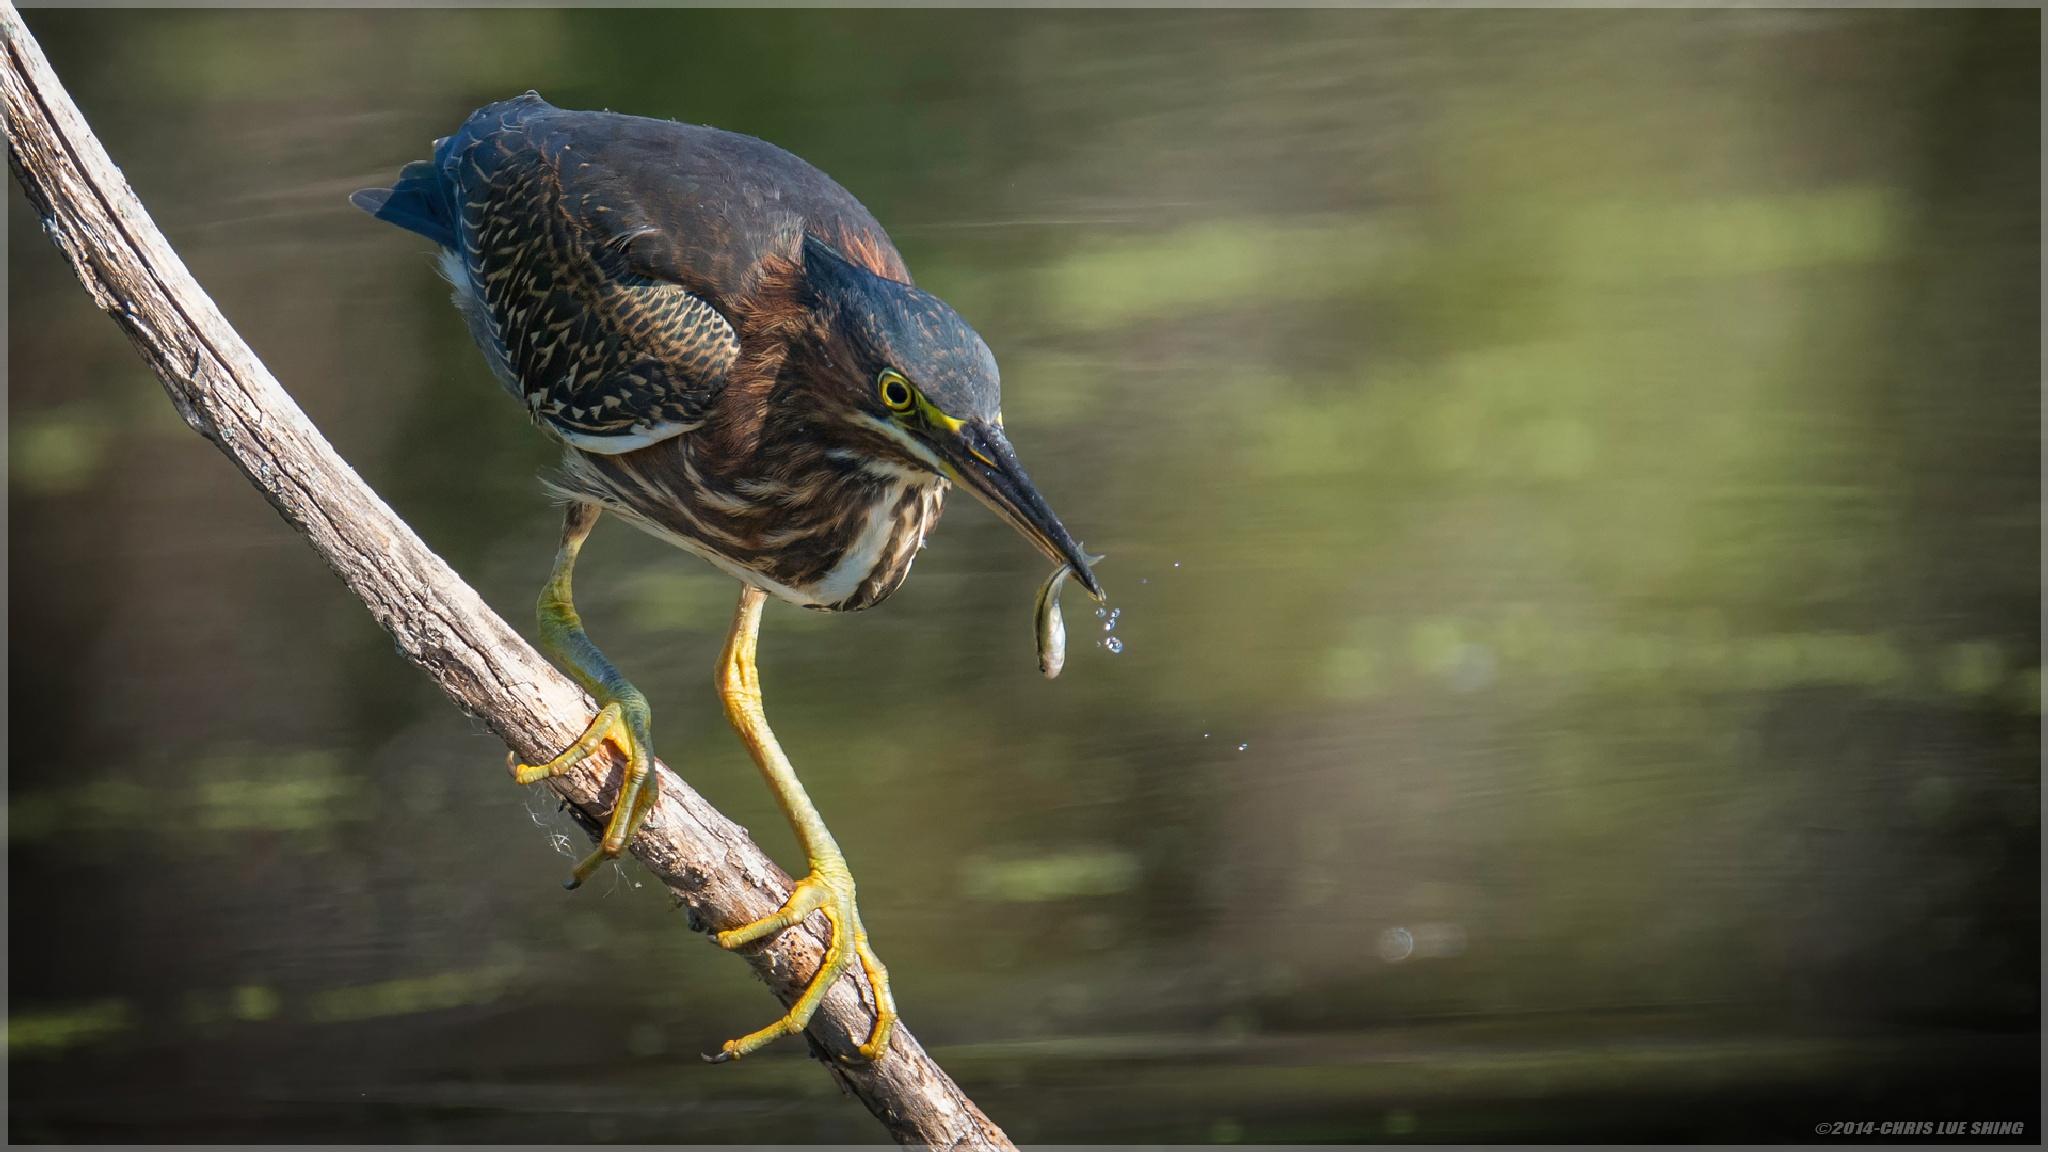 Green Heron by Chris Lue Shing